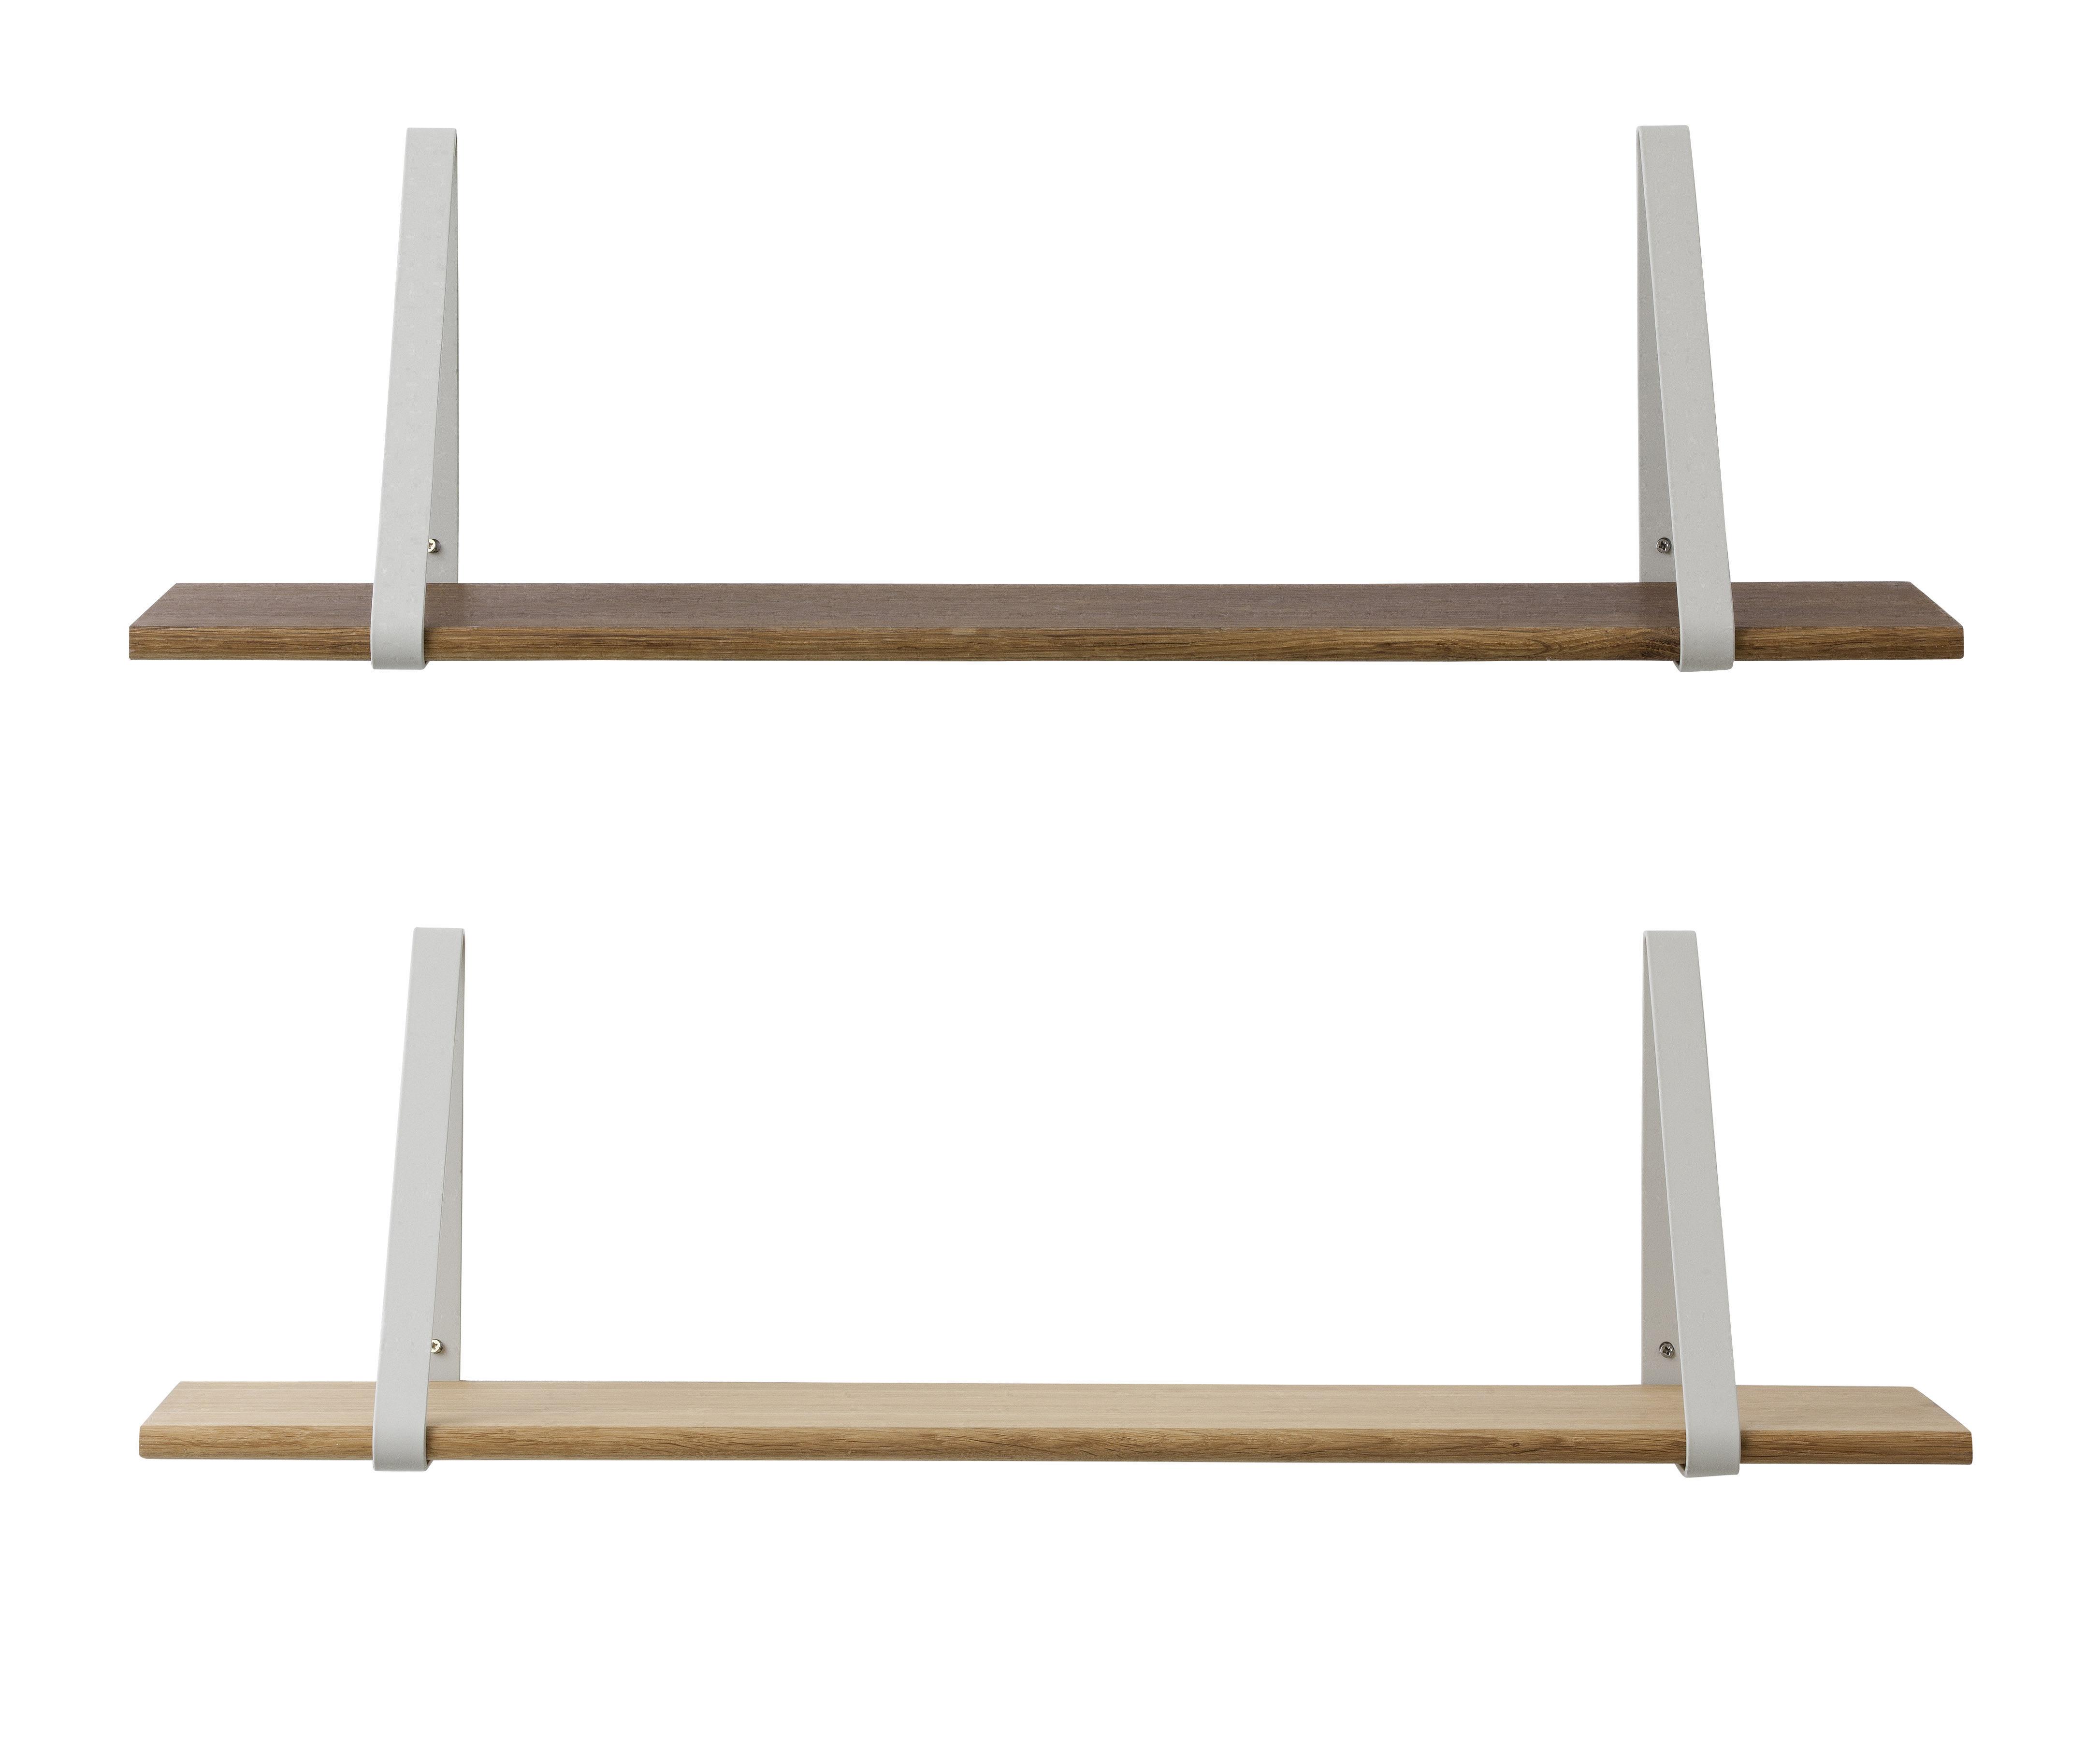 Genial Set Of 2 Shelf Brackets   For The Shelf Grey By Ferm Living | Made In  Design UK